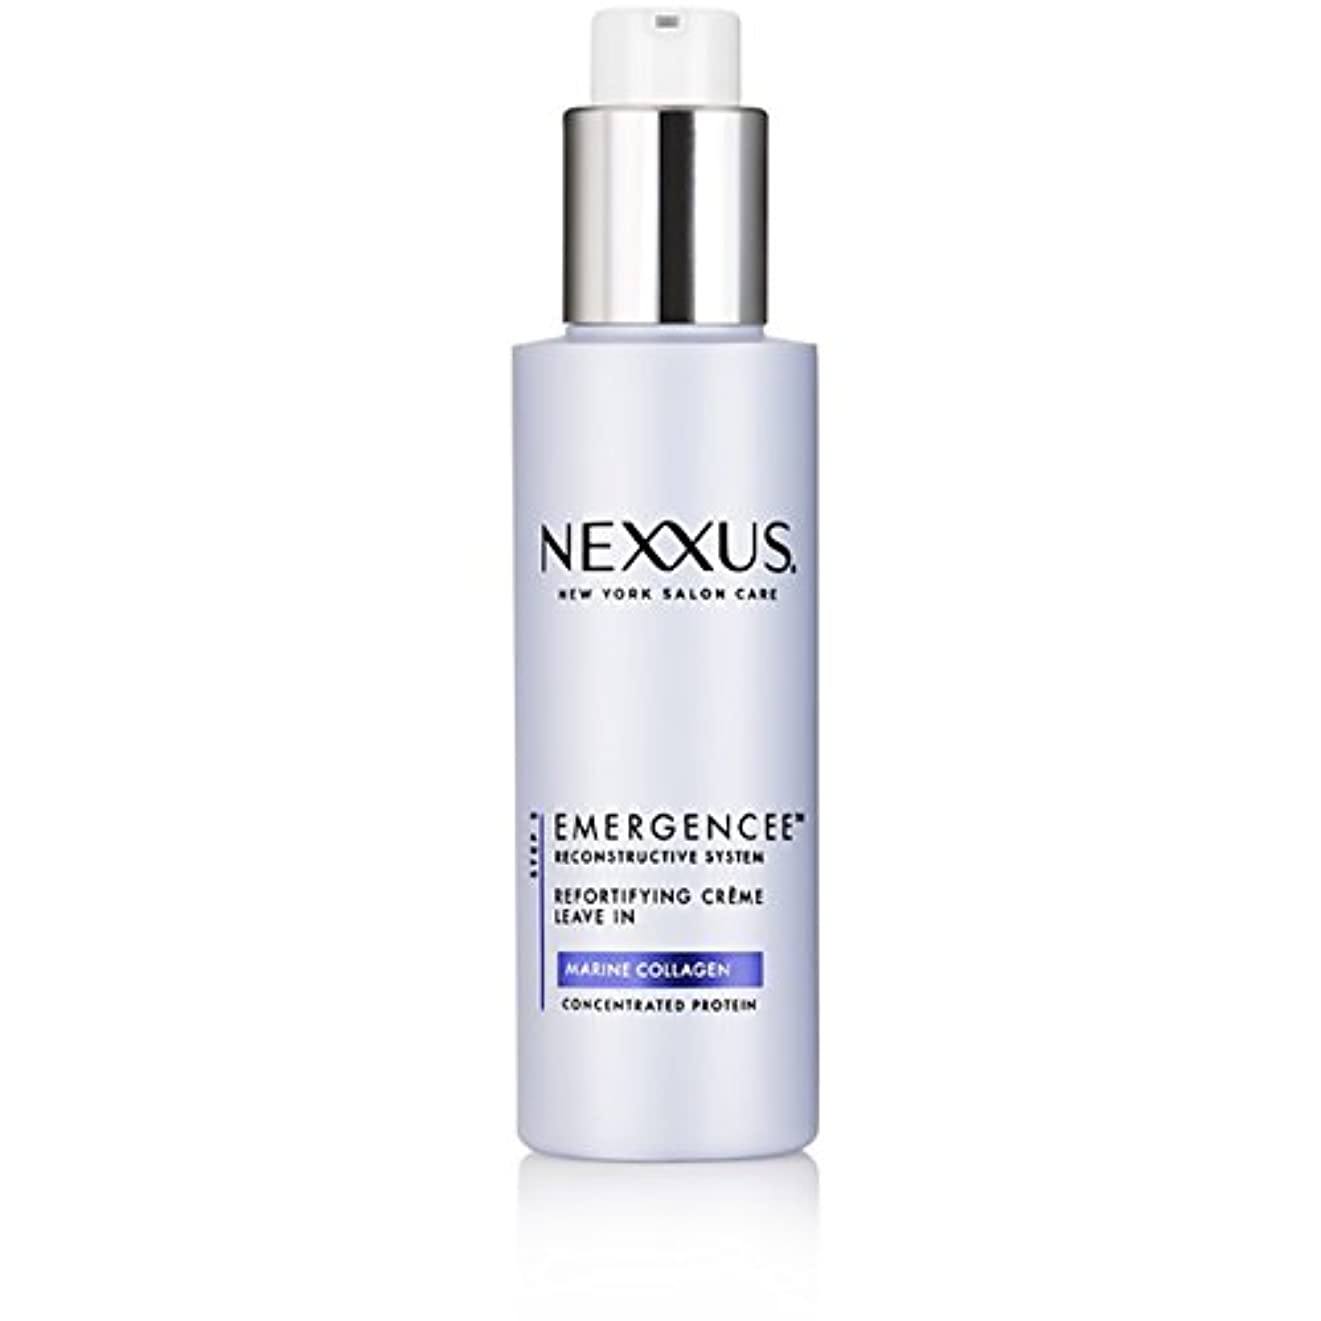 Nexxus Emergenceeはダメージを受けた髪のためにクリーム状にしておきます、150 ml